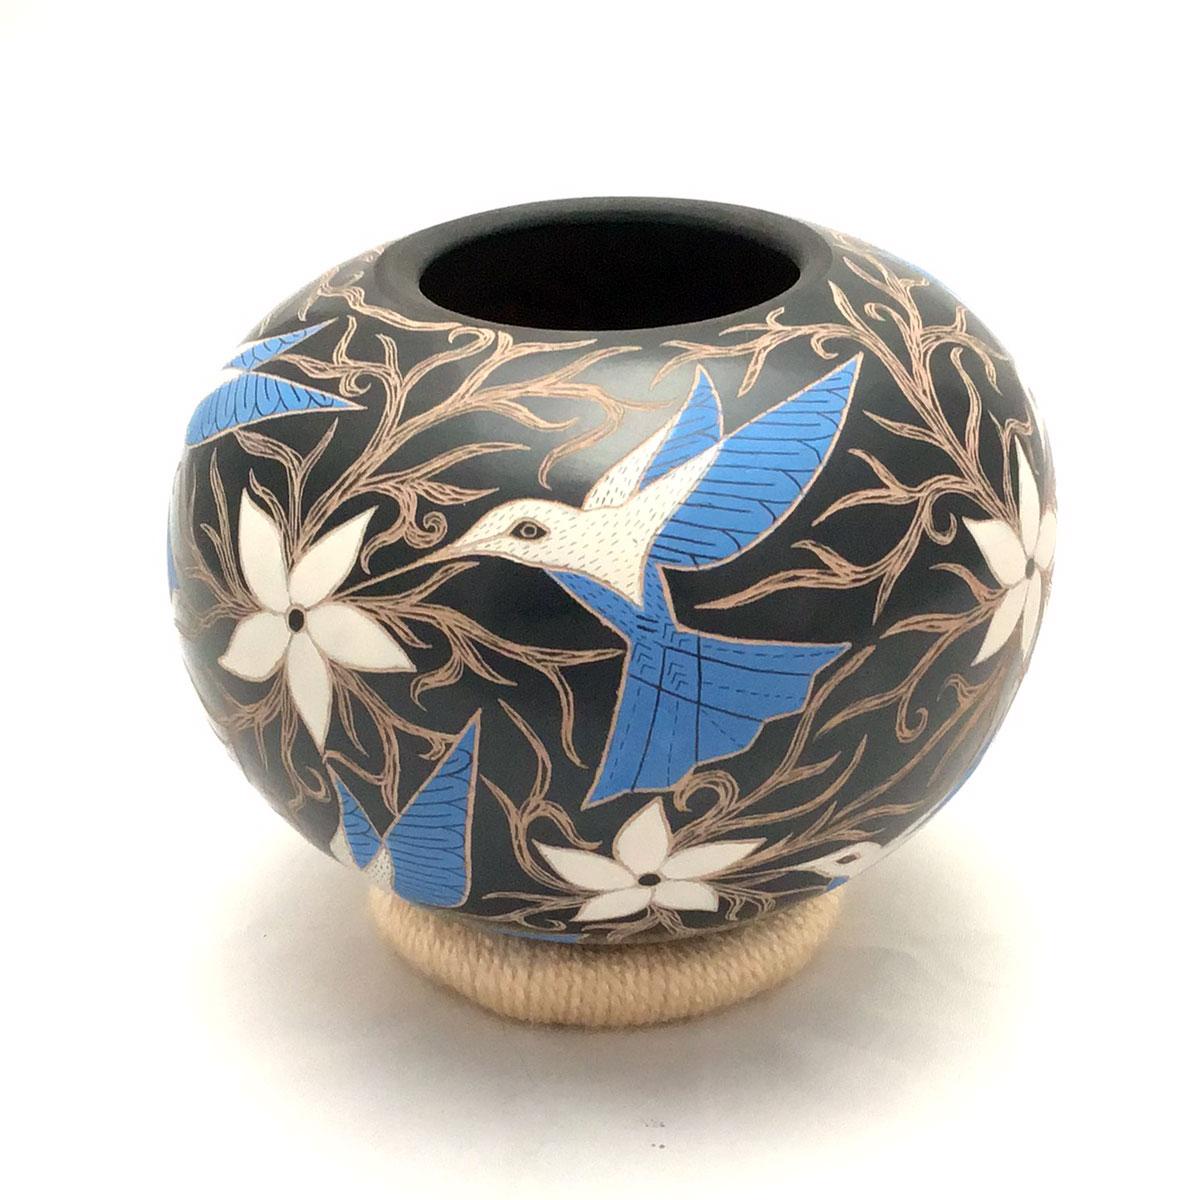 Elicena Cota Elicena Cota and Efrain Lucero:  Etched Black Pot with Hummingbirds Birds